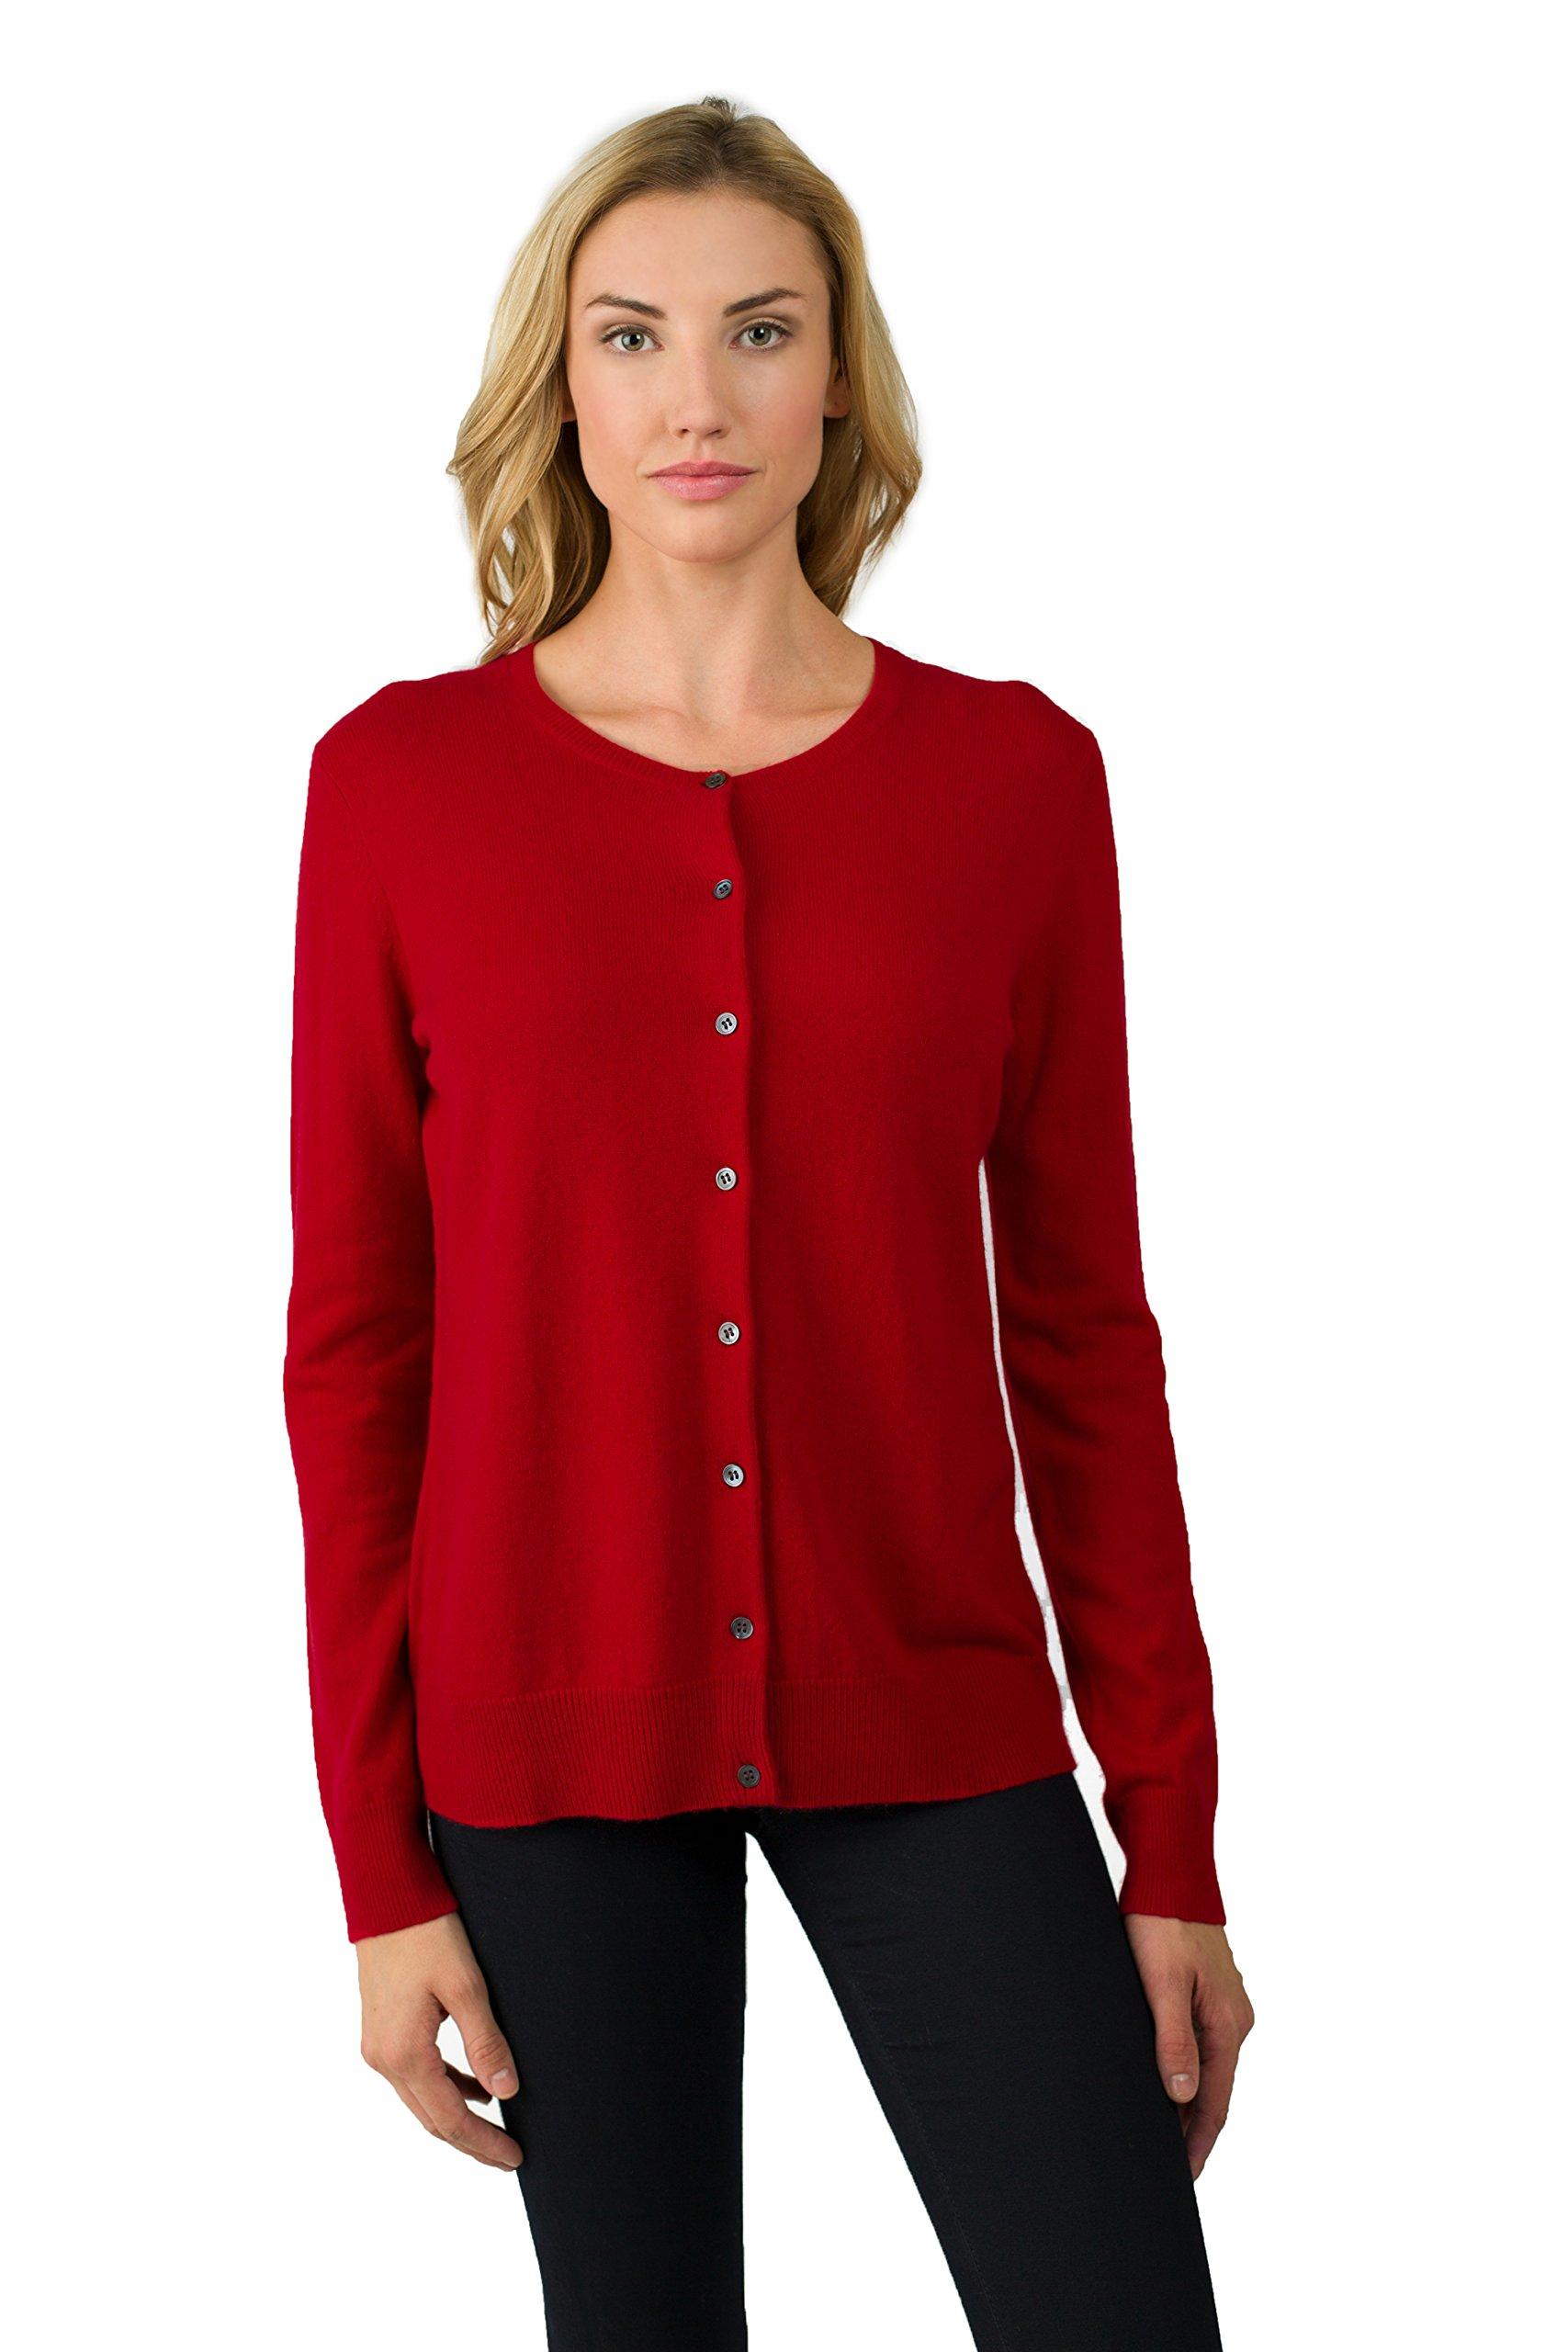 JENNIE LIU Women's 100% Cashmere Button Front Long Sleeve Crewneck Cardigan Sweater (M, Red)